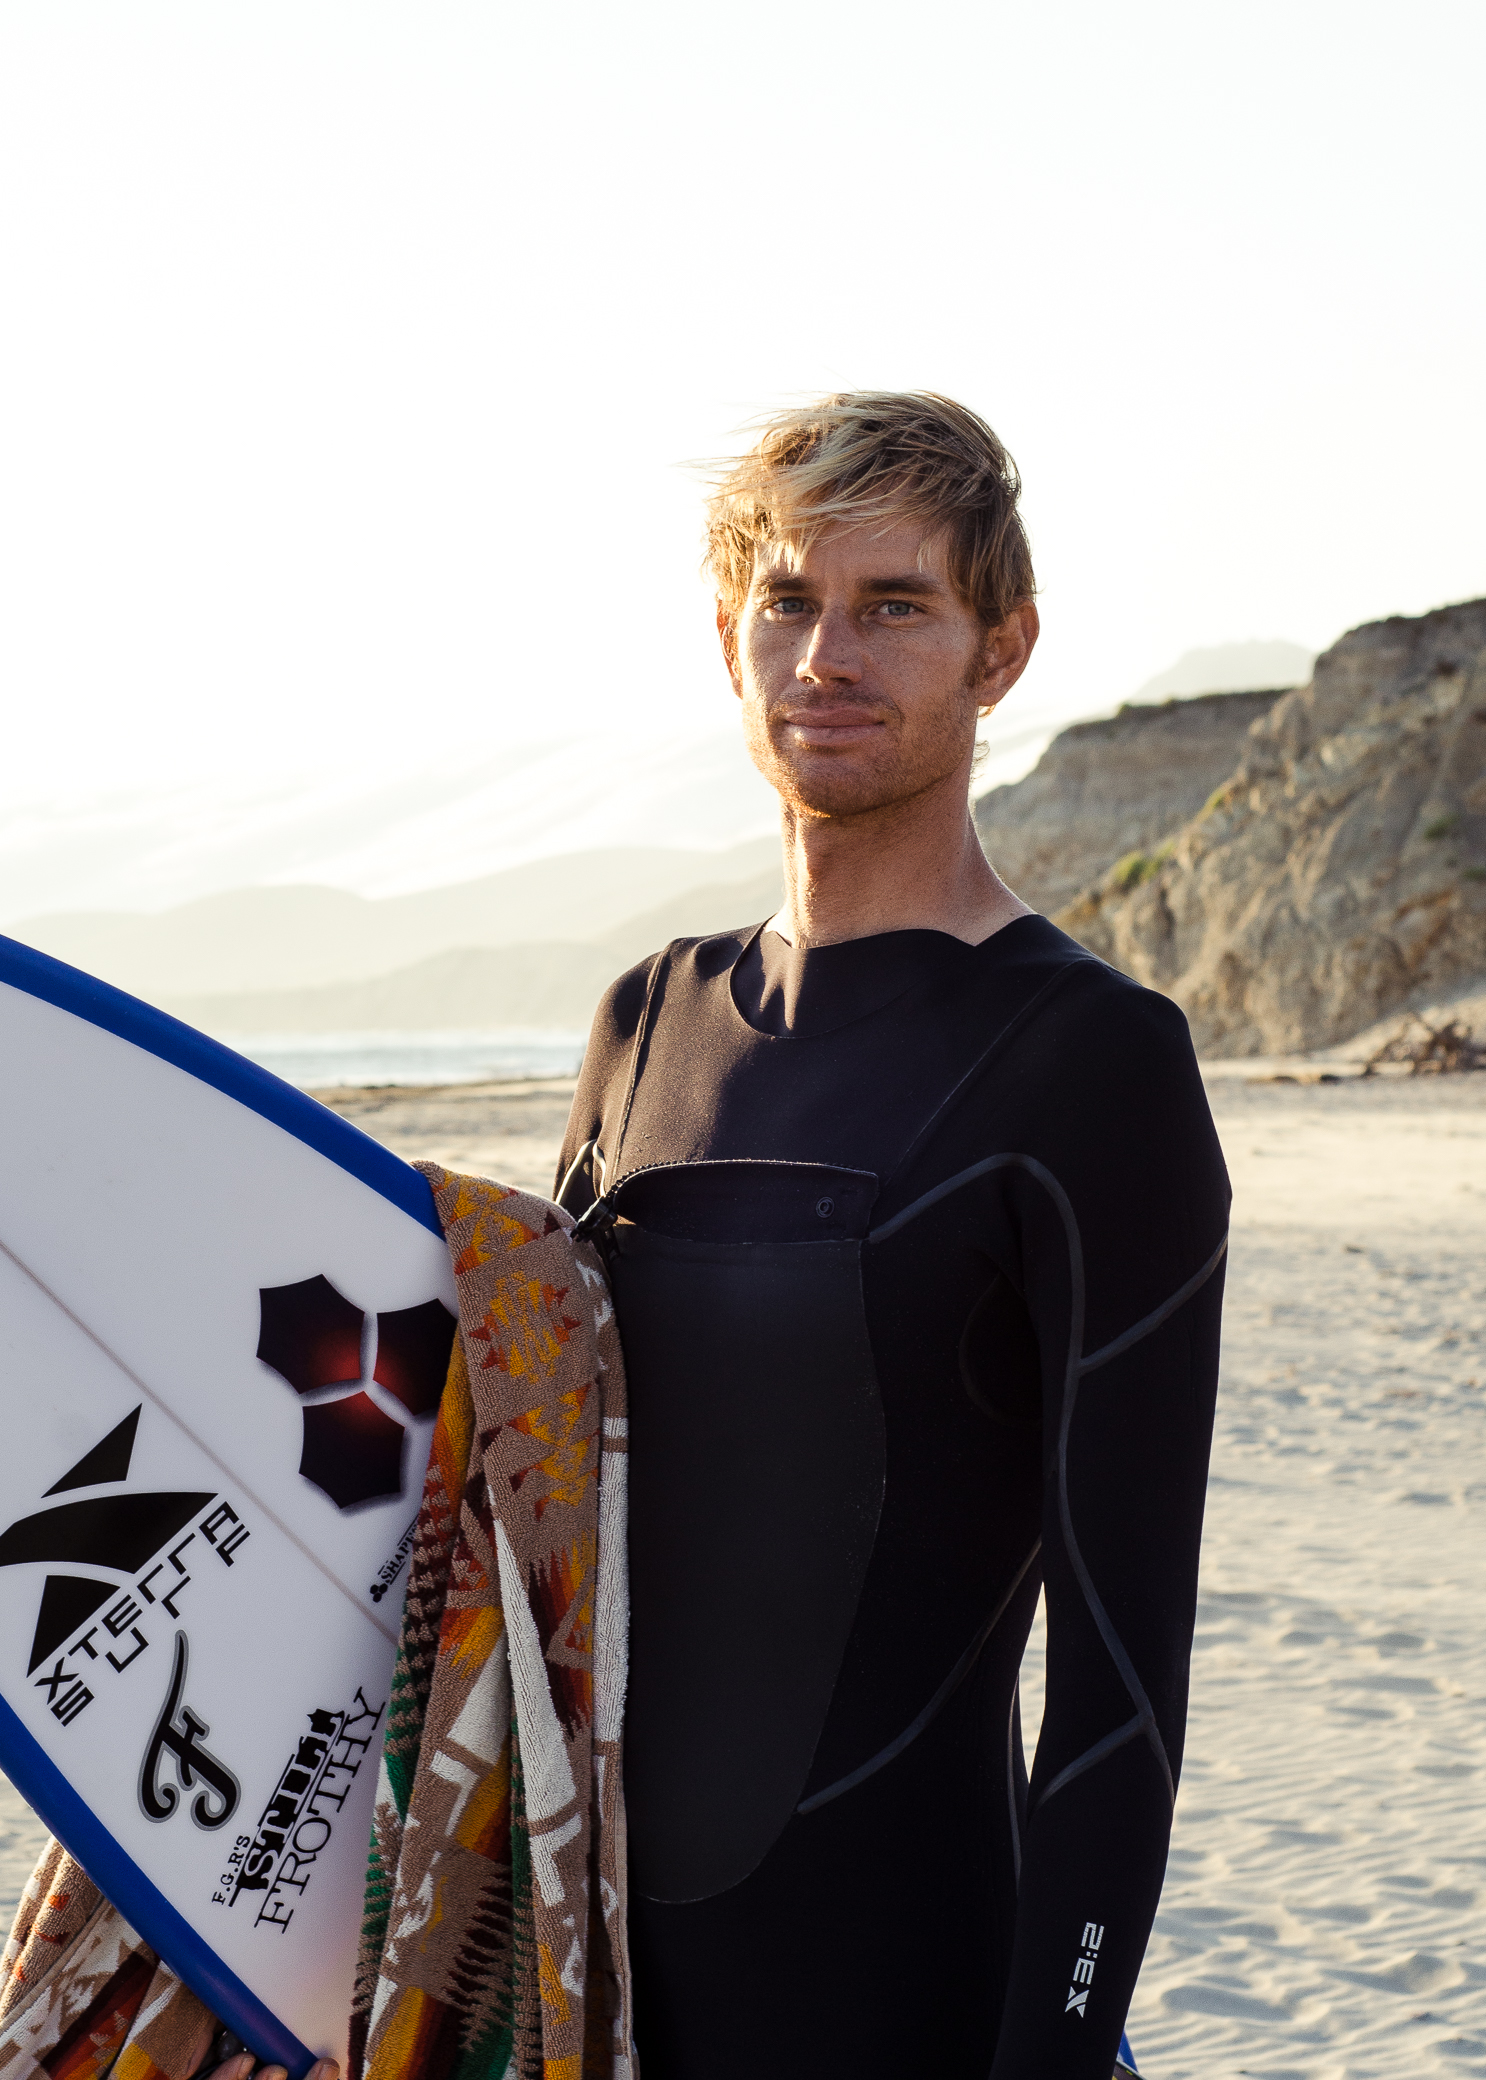 Kilian Garland Santa Barbara Surfer Portrait Miranda Kelton Photography